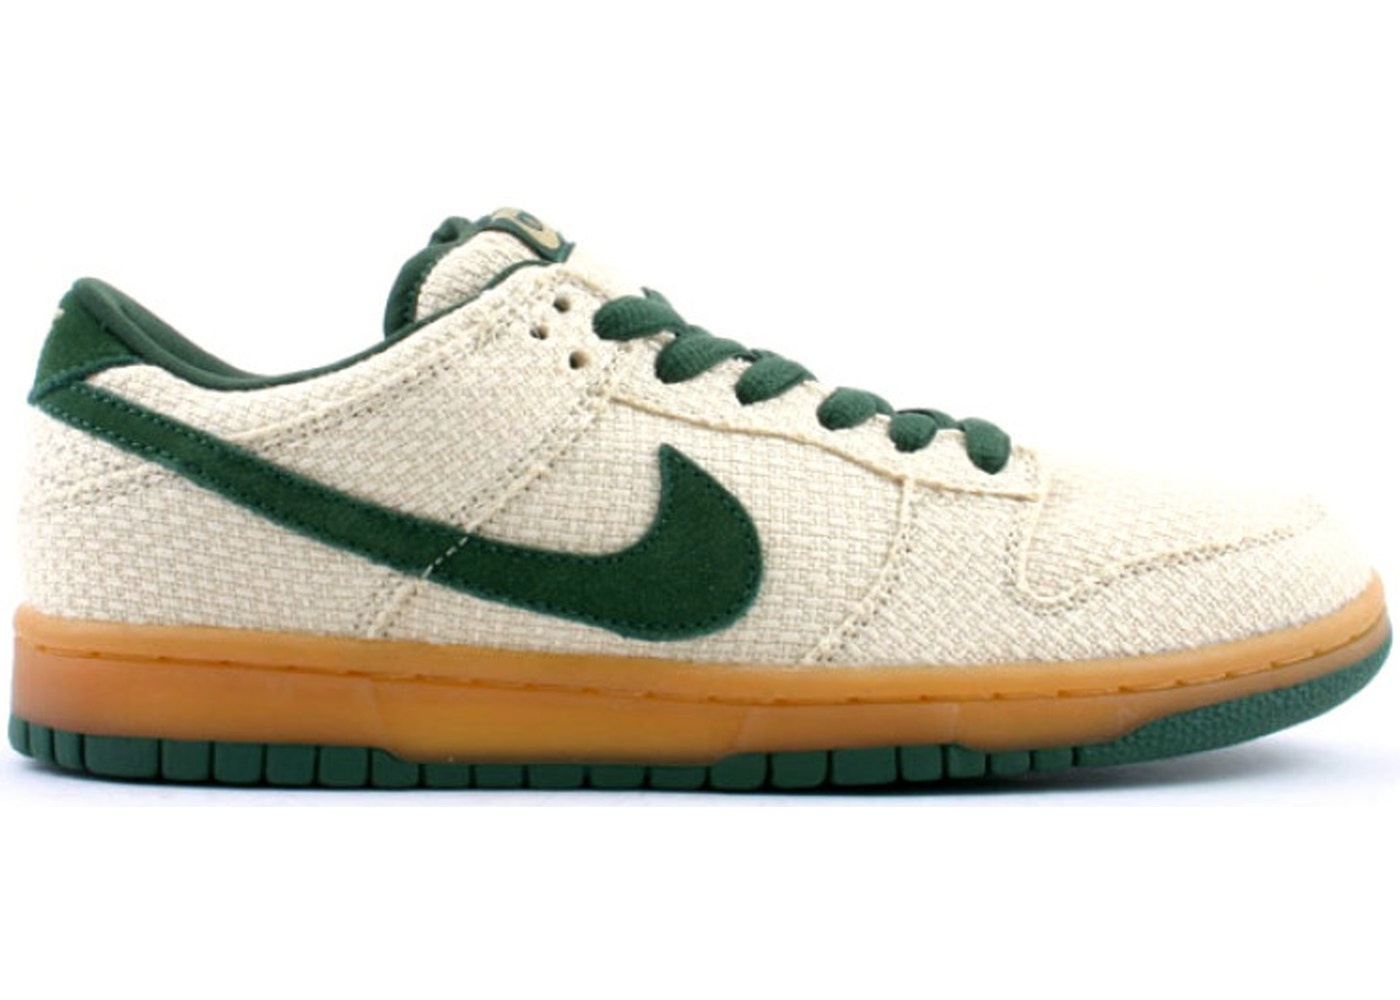 best website aaacf 53929 Nike SB Dunk Low Green Hemp